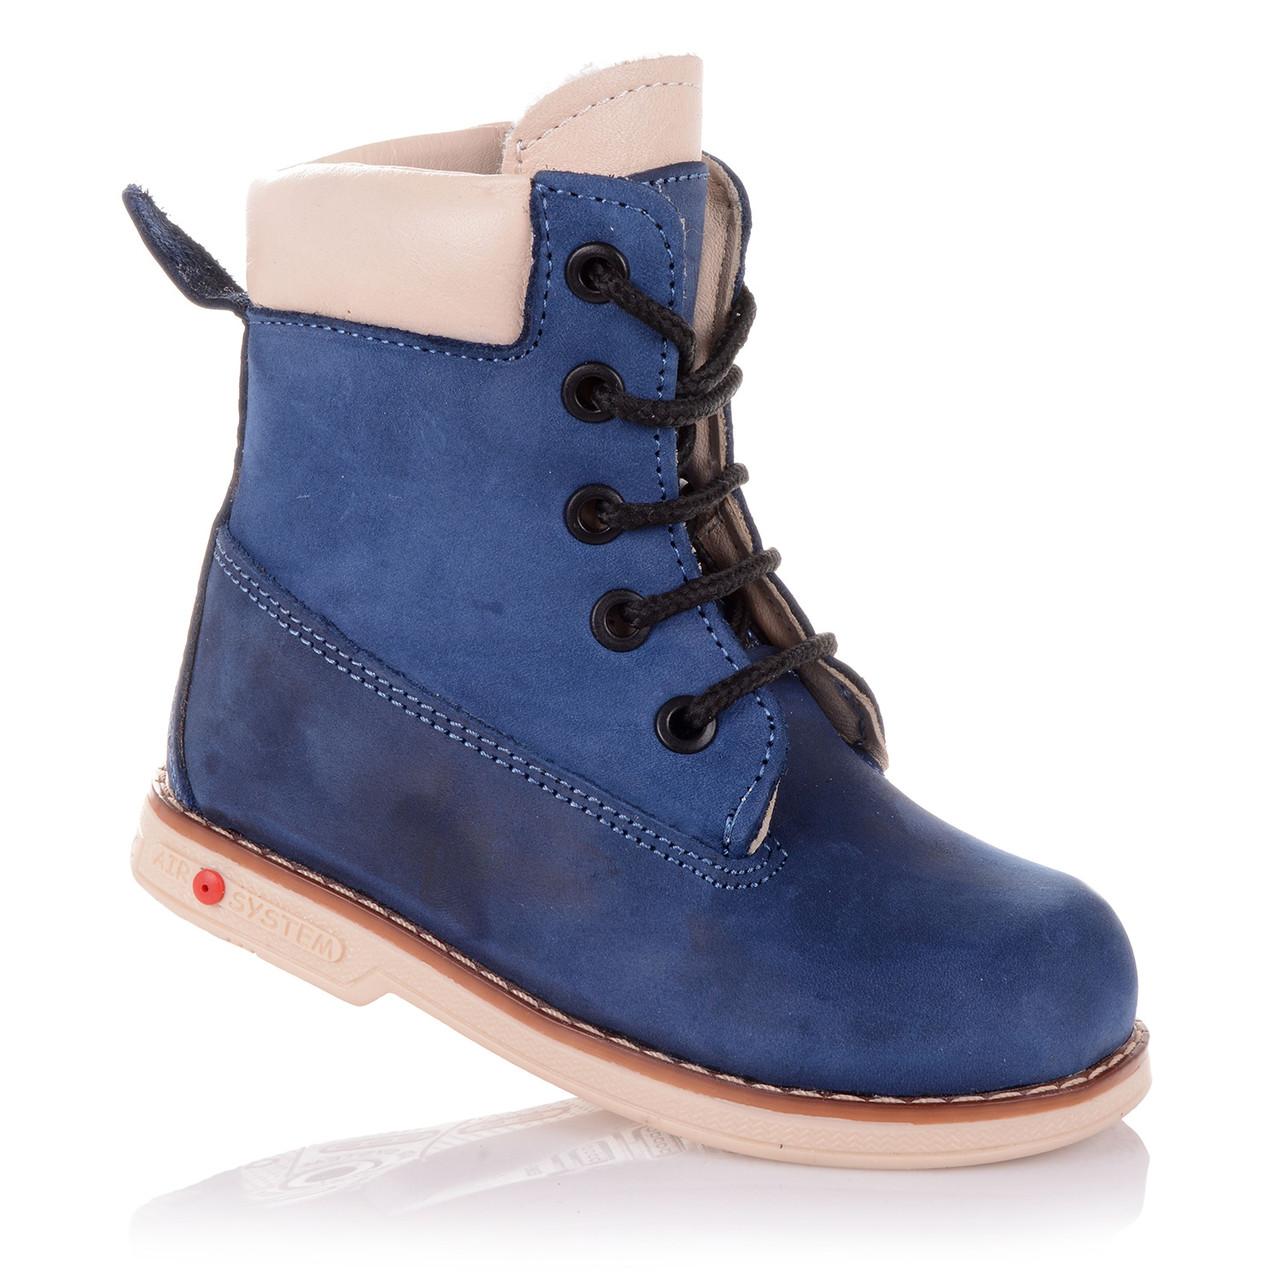 baa13268a Зимняя обувь для мальчиков Tofino 5.4.293 (21-25), цена 980 грн ...